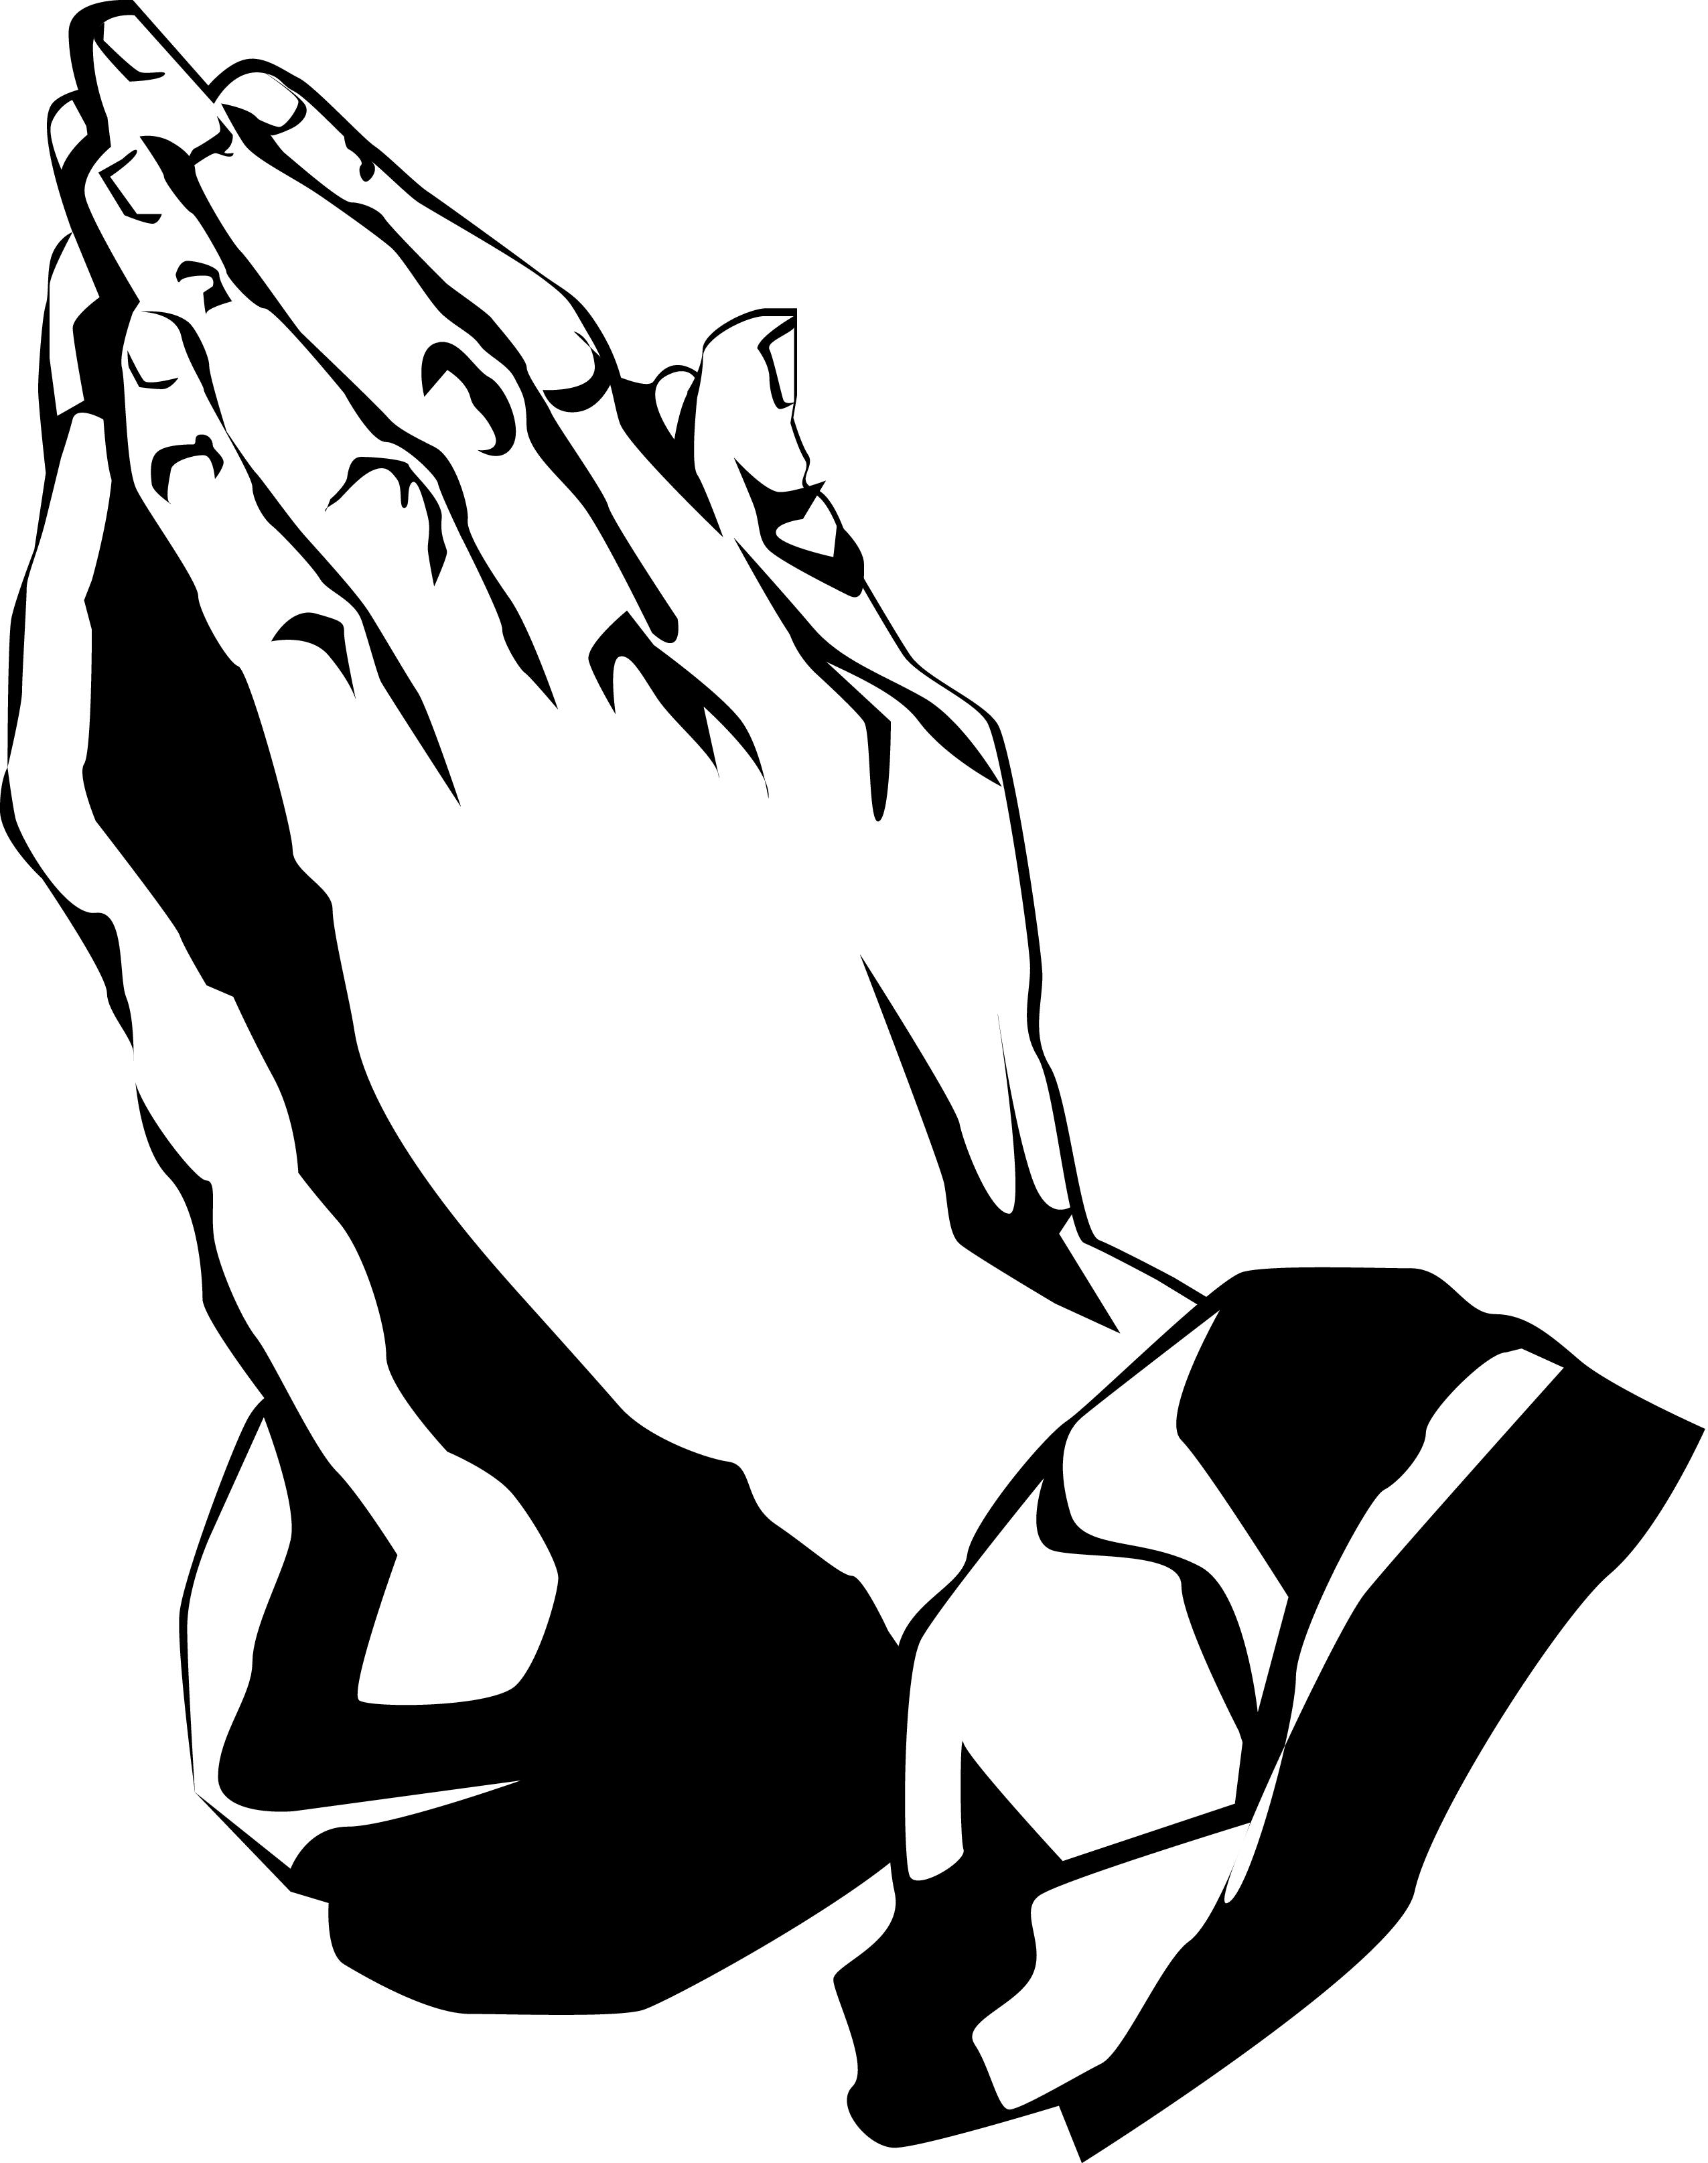 Prayer Hands Clipart Clipart Panda Free Clipart Images